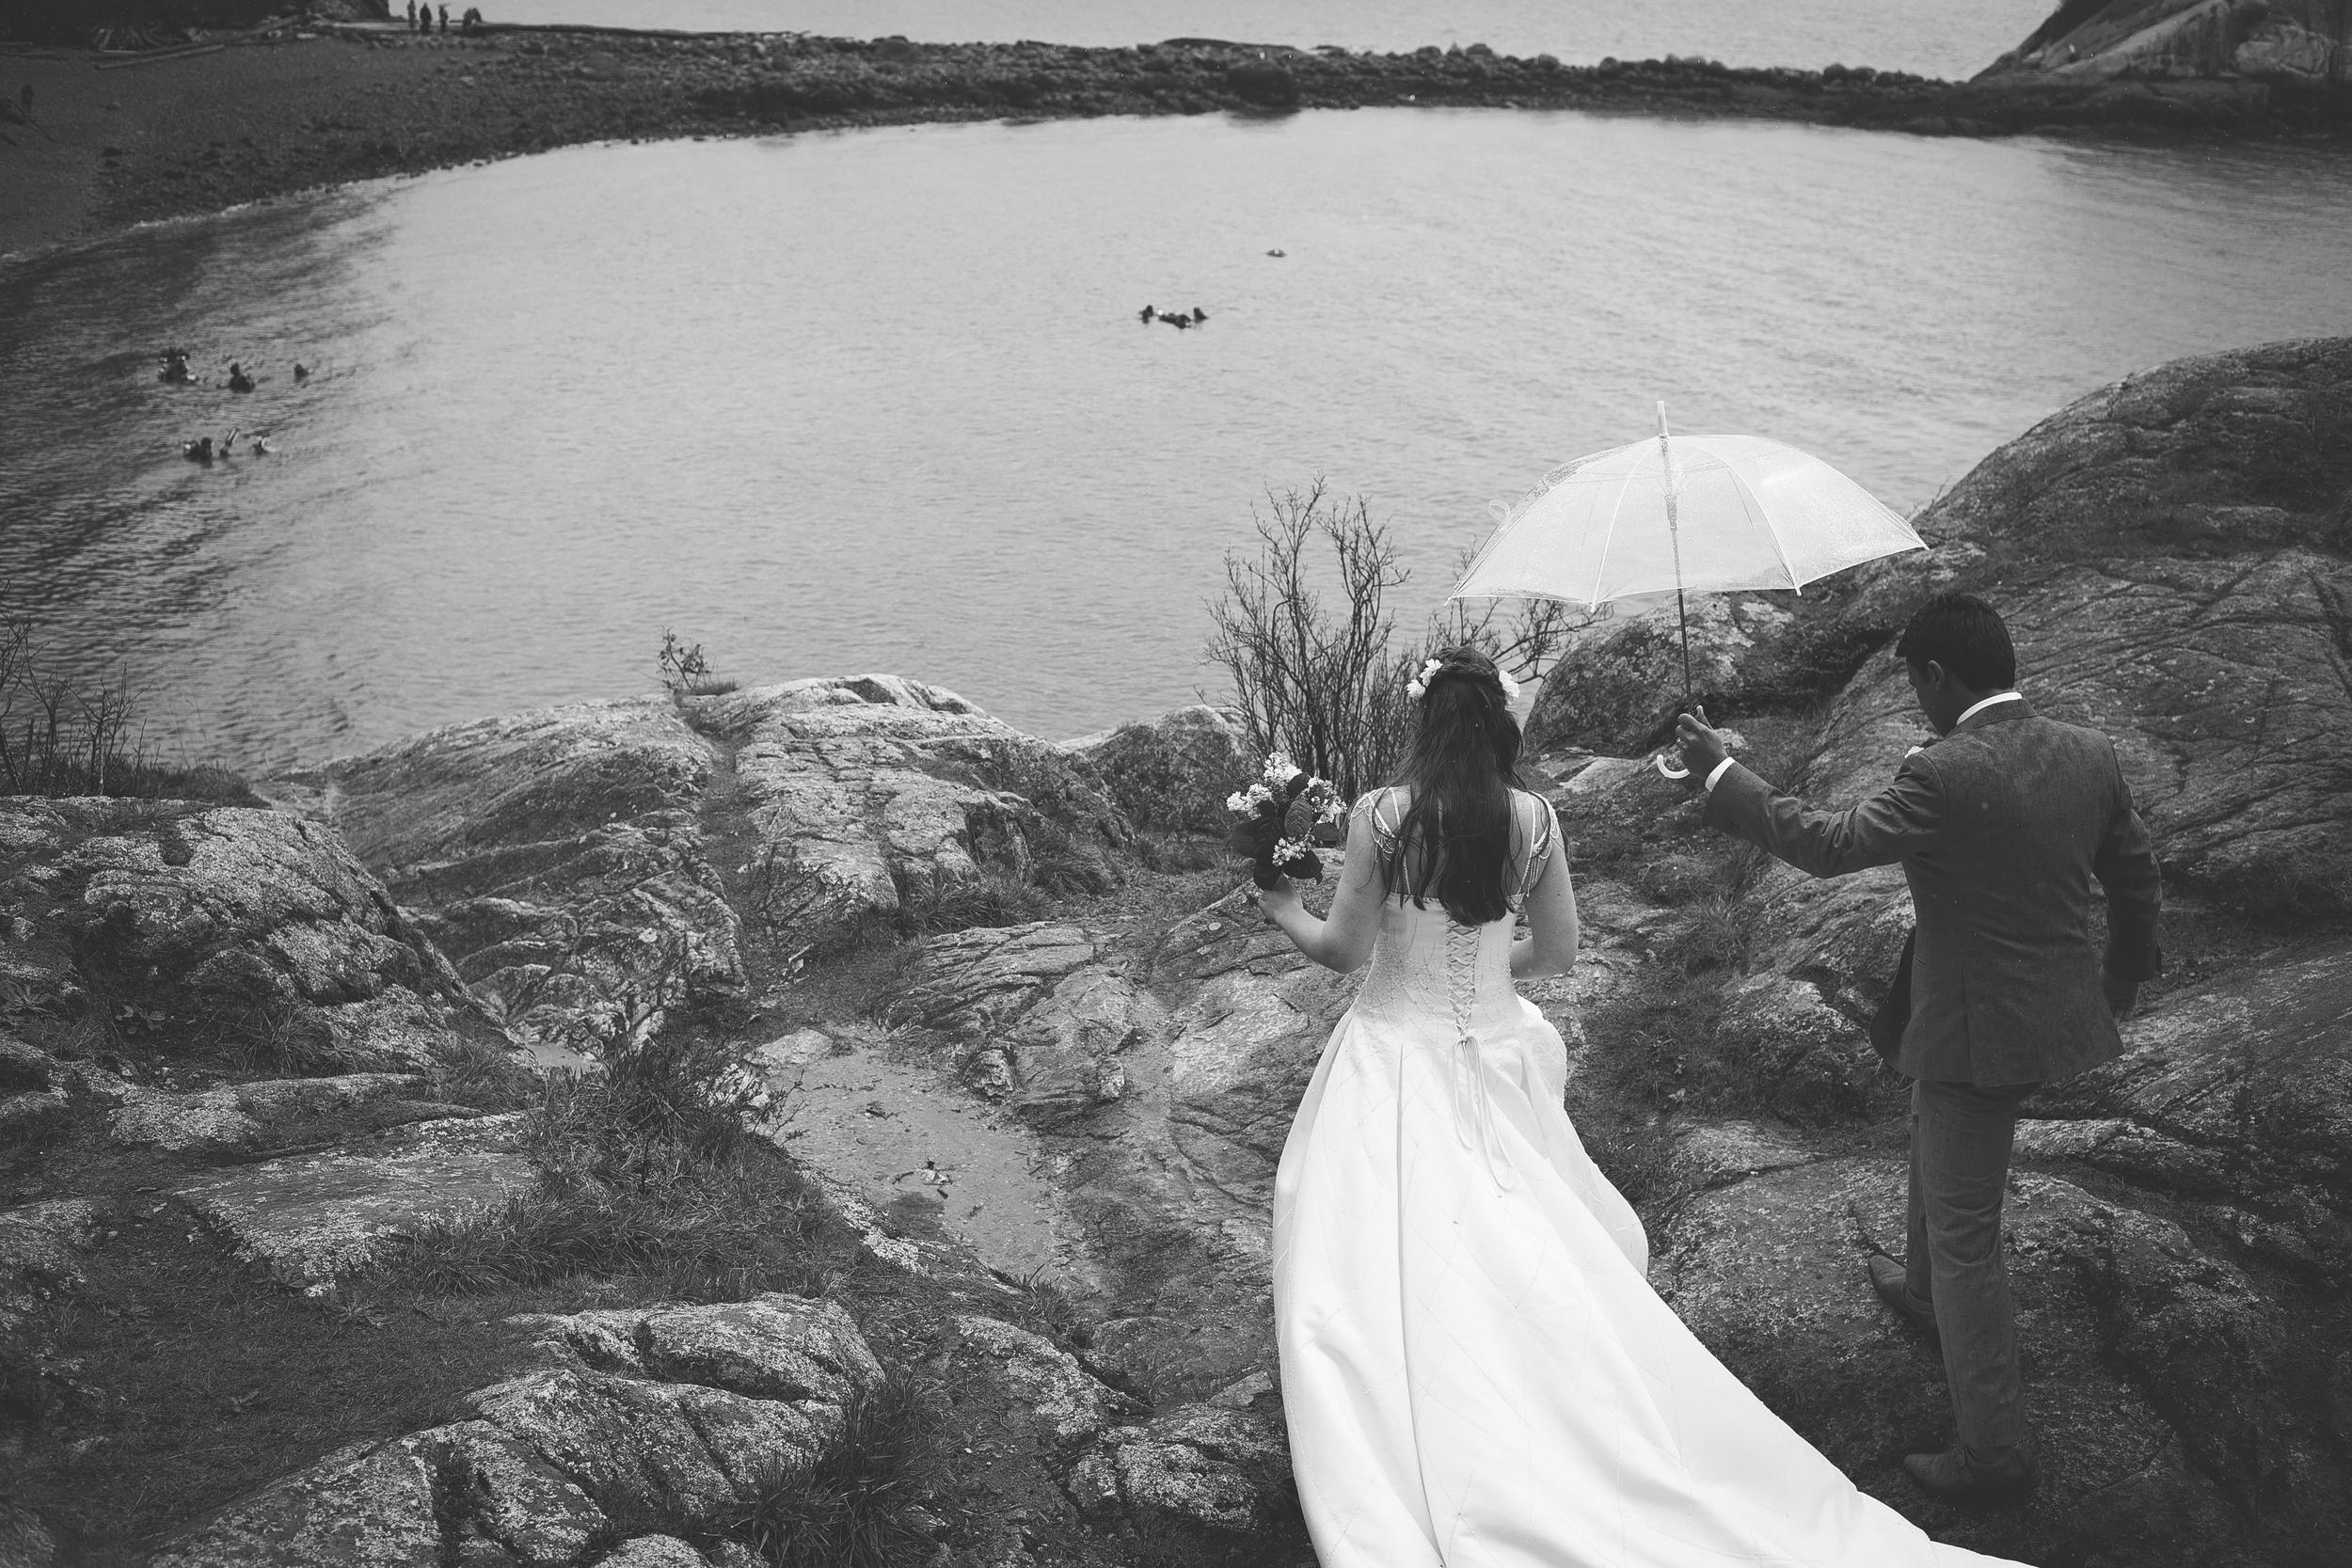 vancouver_photographer_wedding_DogwoodPhotography-14.jpg